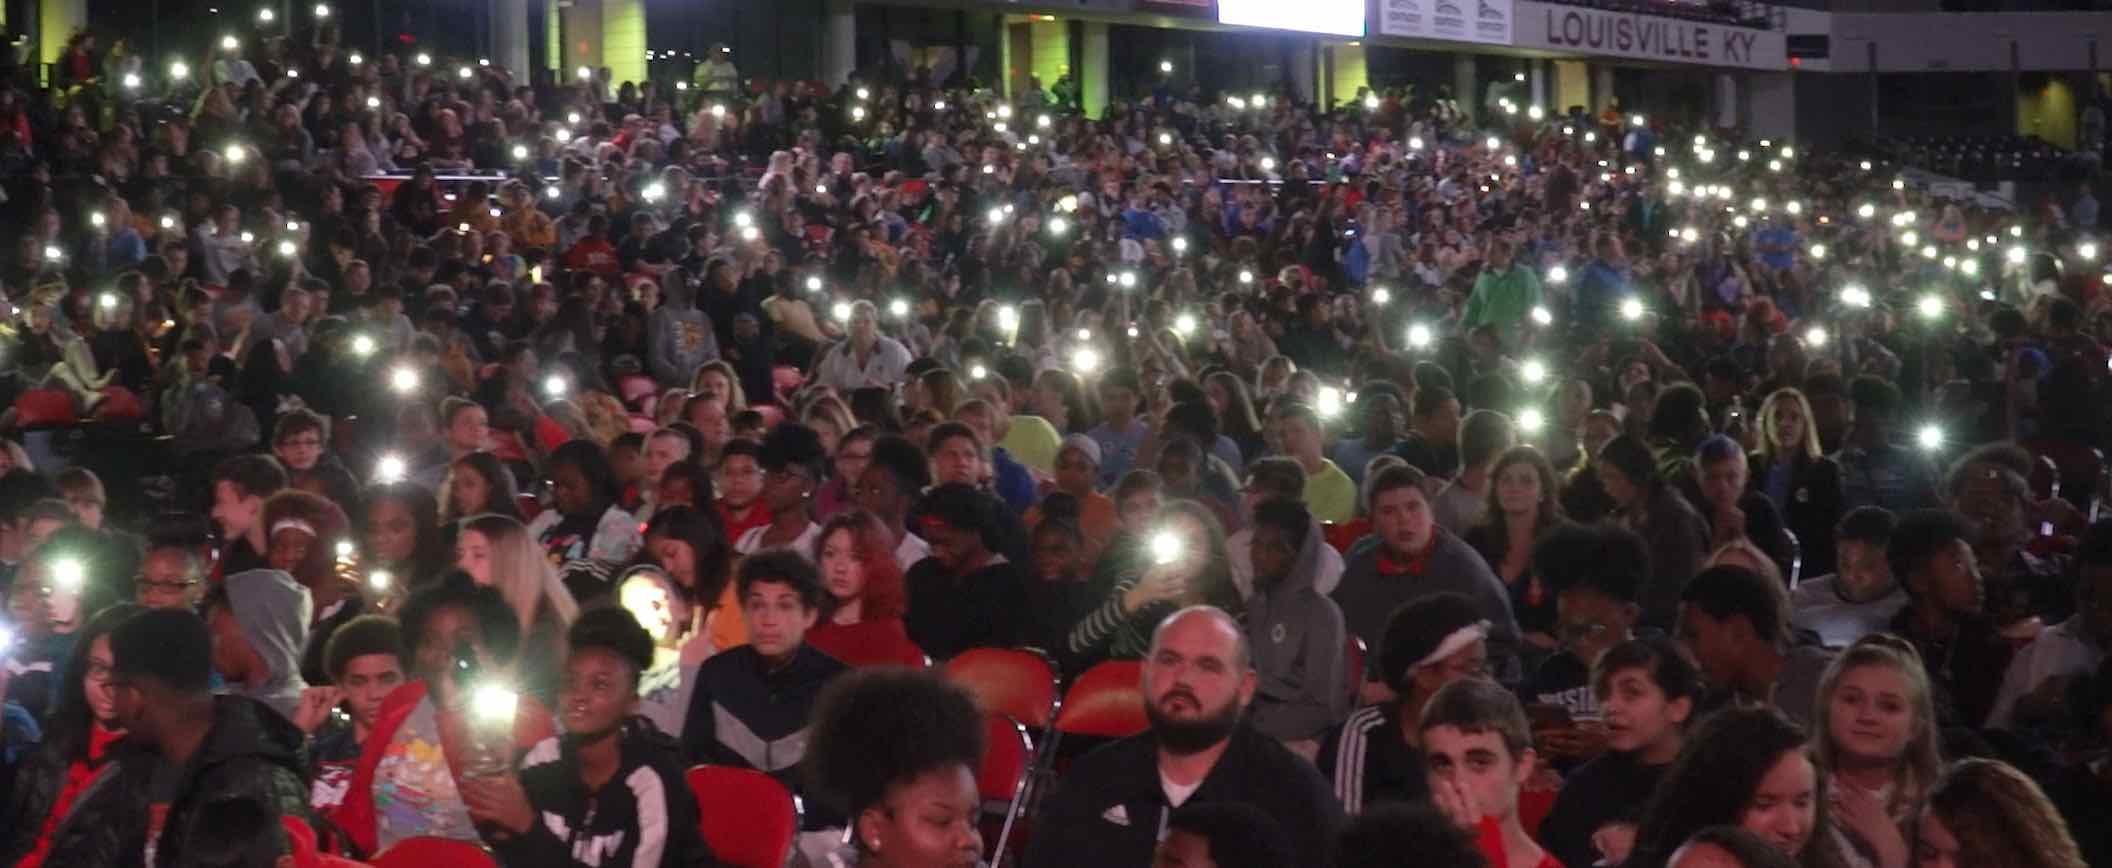 Crowd 10.jpeg